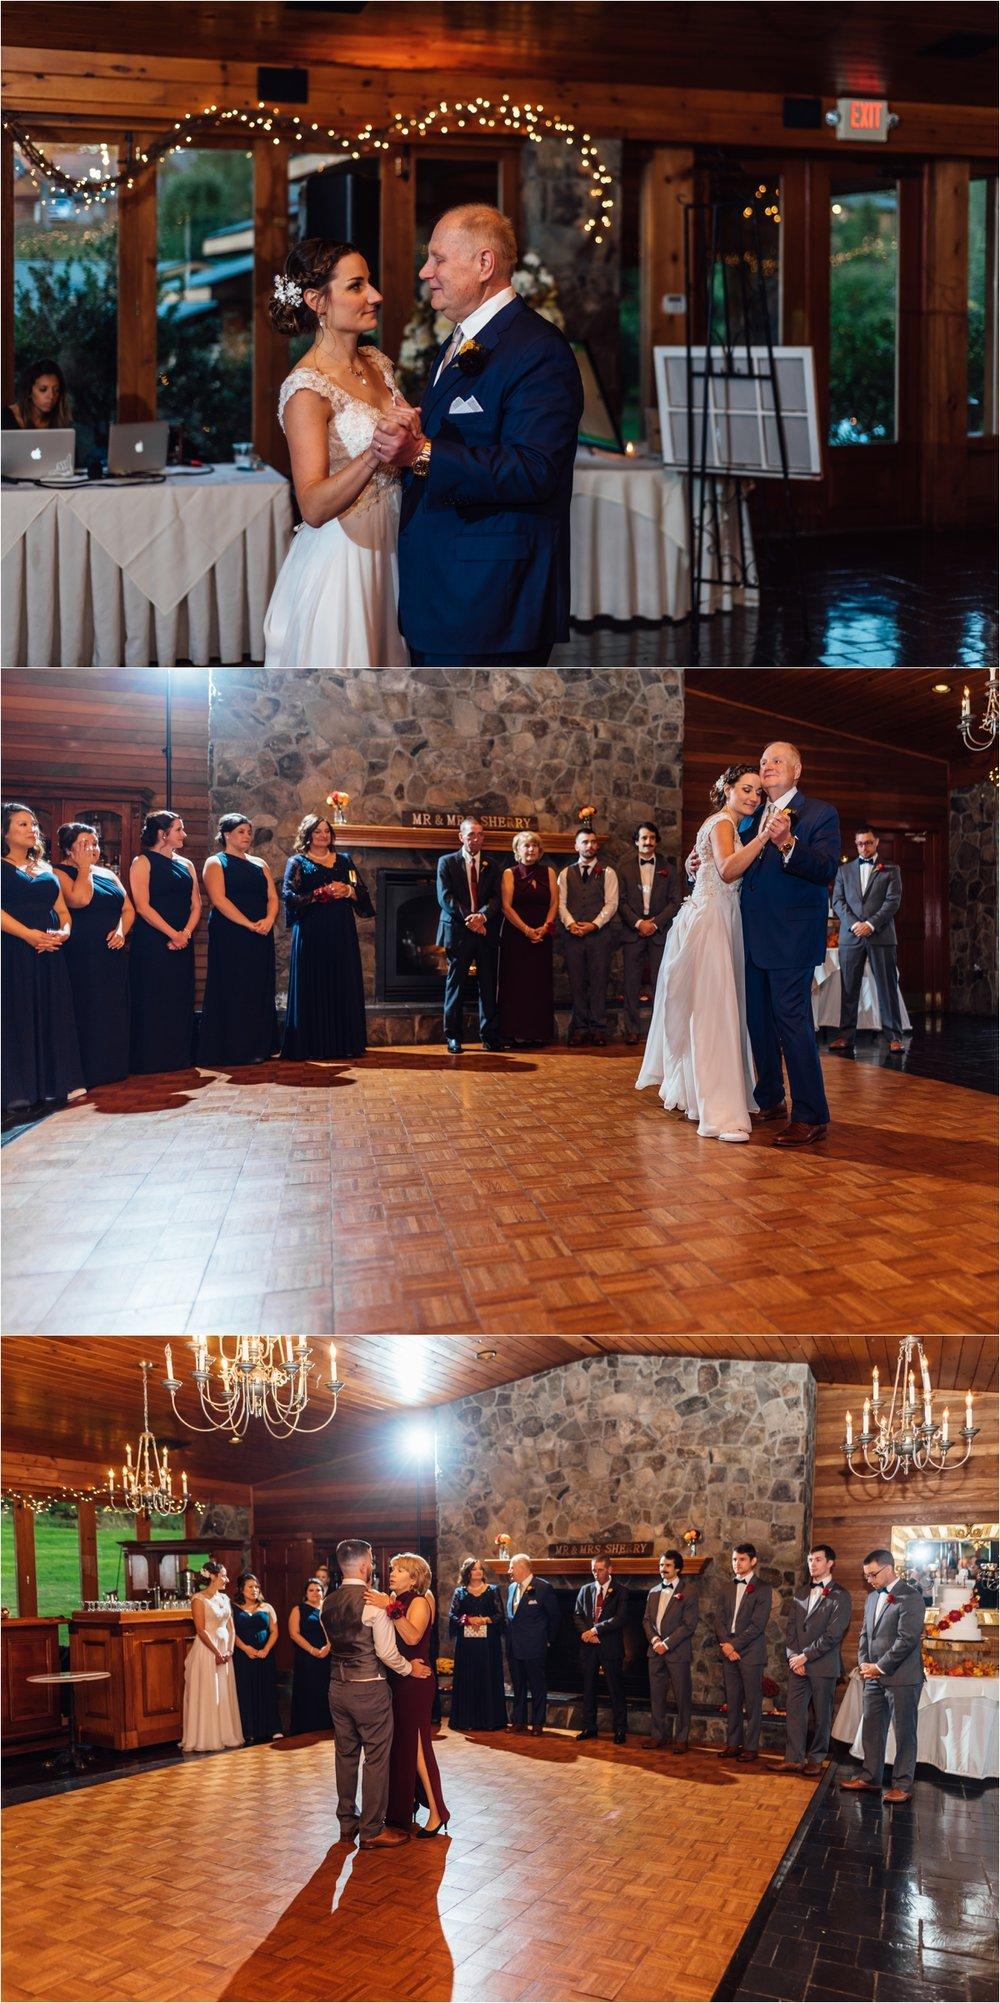 Sarah_&_Doug_Stroudsberg_Wedding_the_photo_farm_0047.jpg